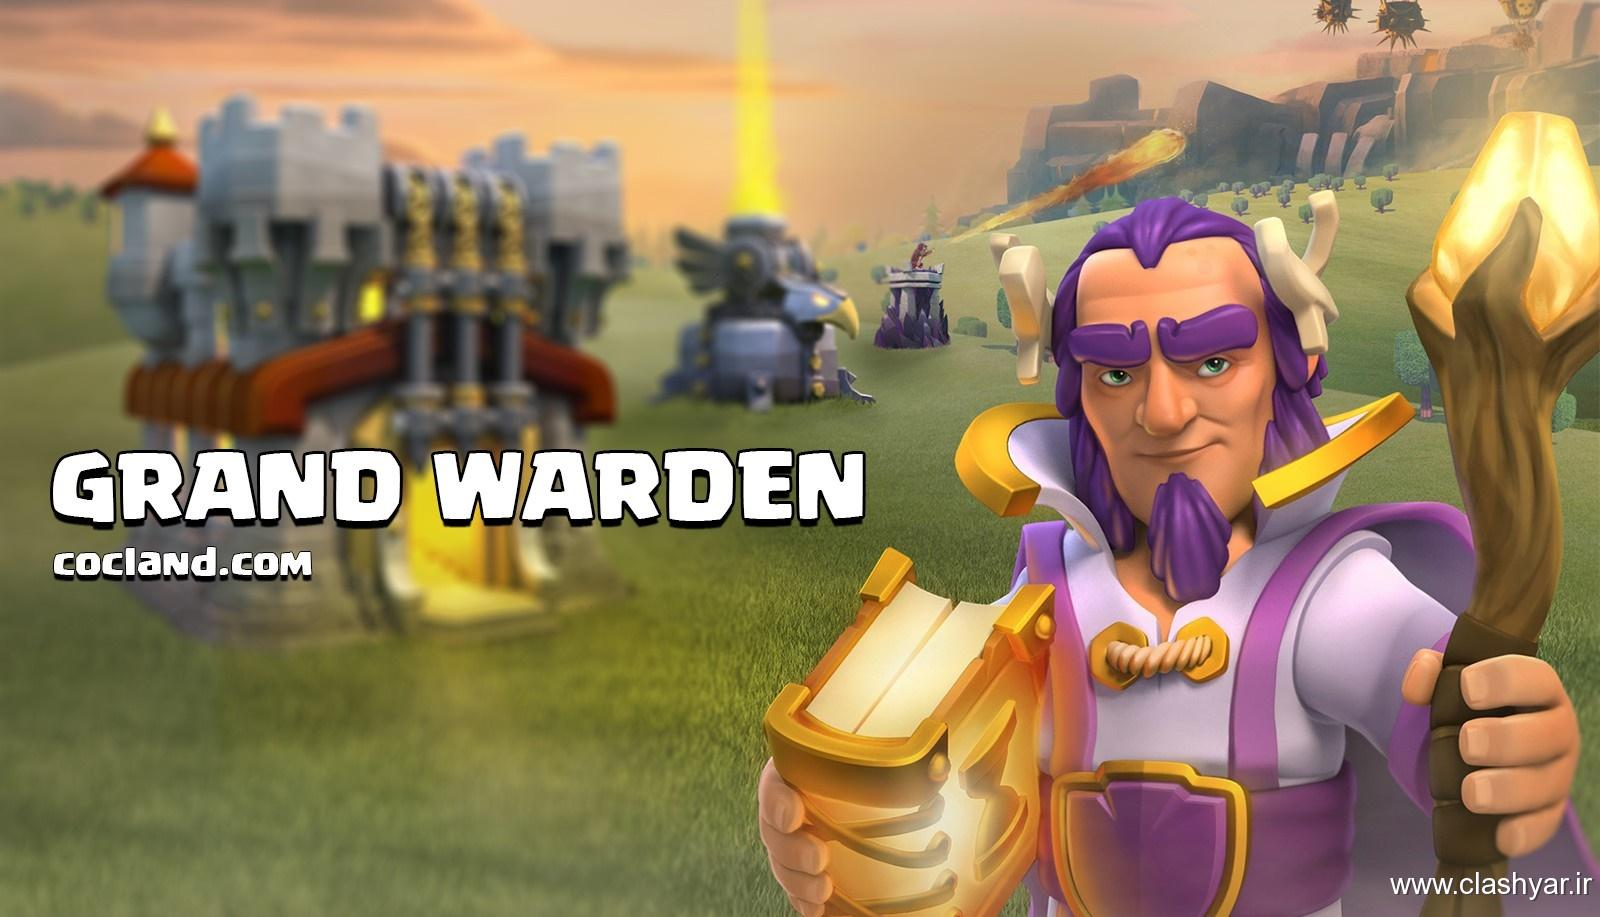 معرفی کامل Grand WARden قهرمان جدید کلش آف کلنز